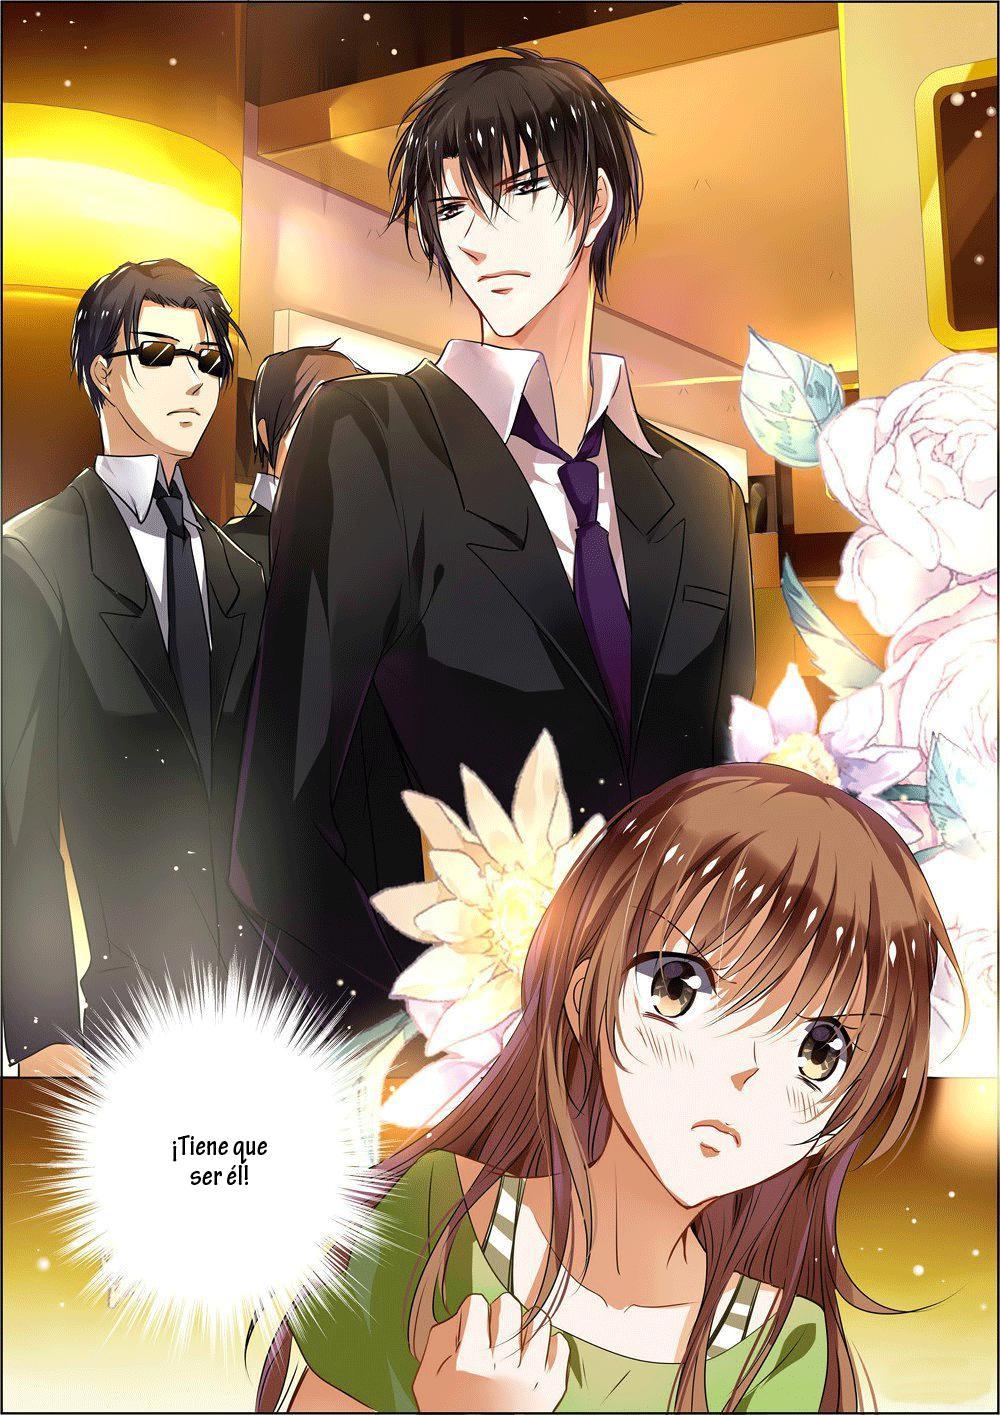 http://c5.ninemanga.com/es_manga/5/16069/385053/dda208749f101159d5b6f121a1e75b98.jpg Page 5